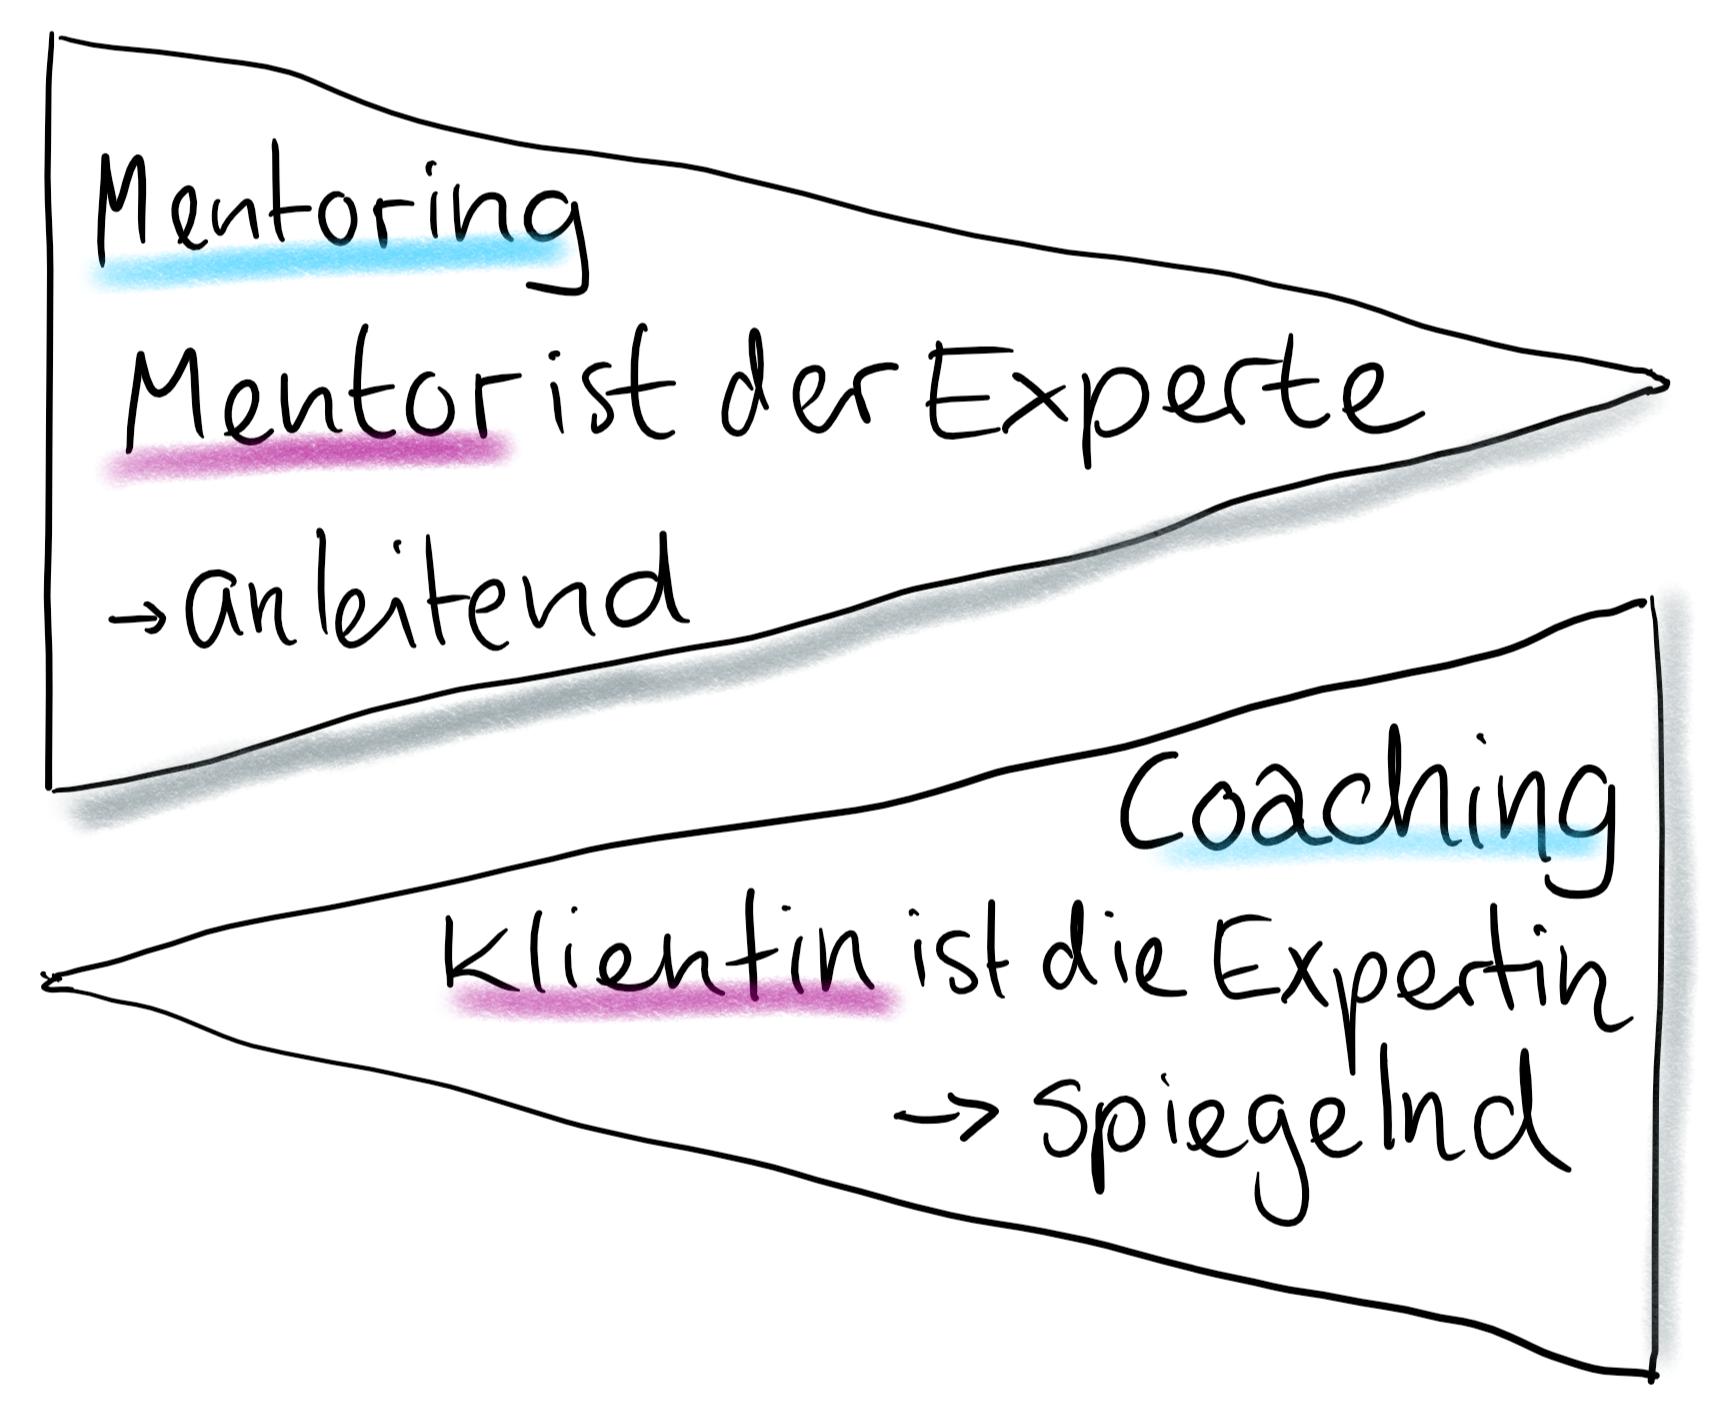 Mentoring & Coaching im Vergleich